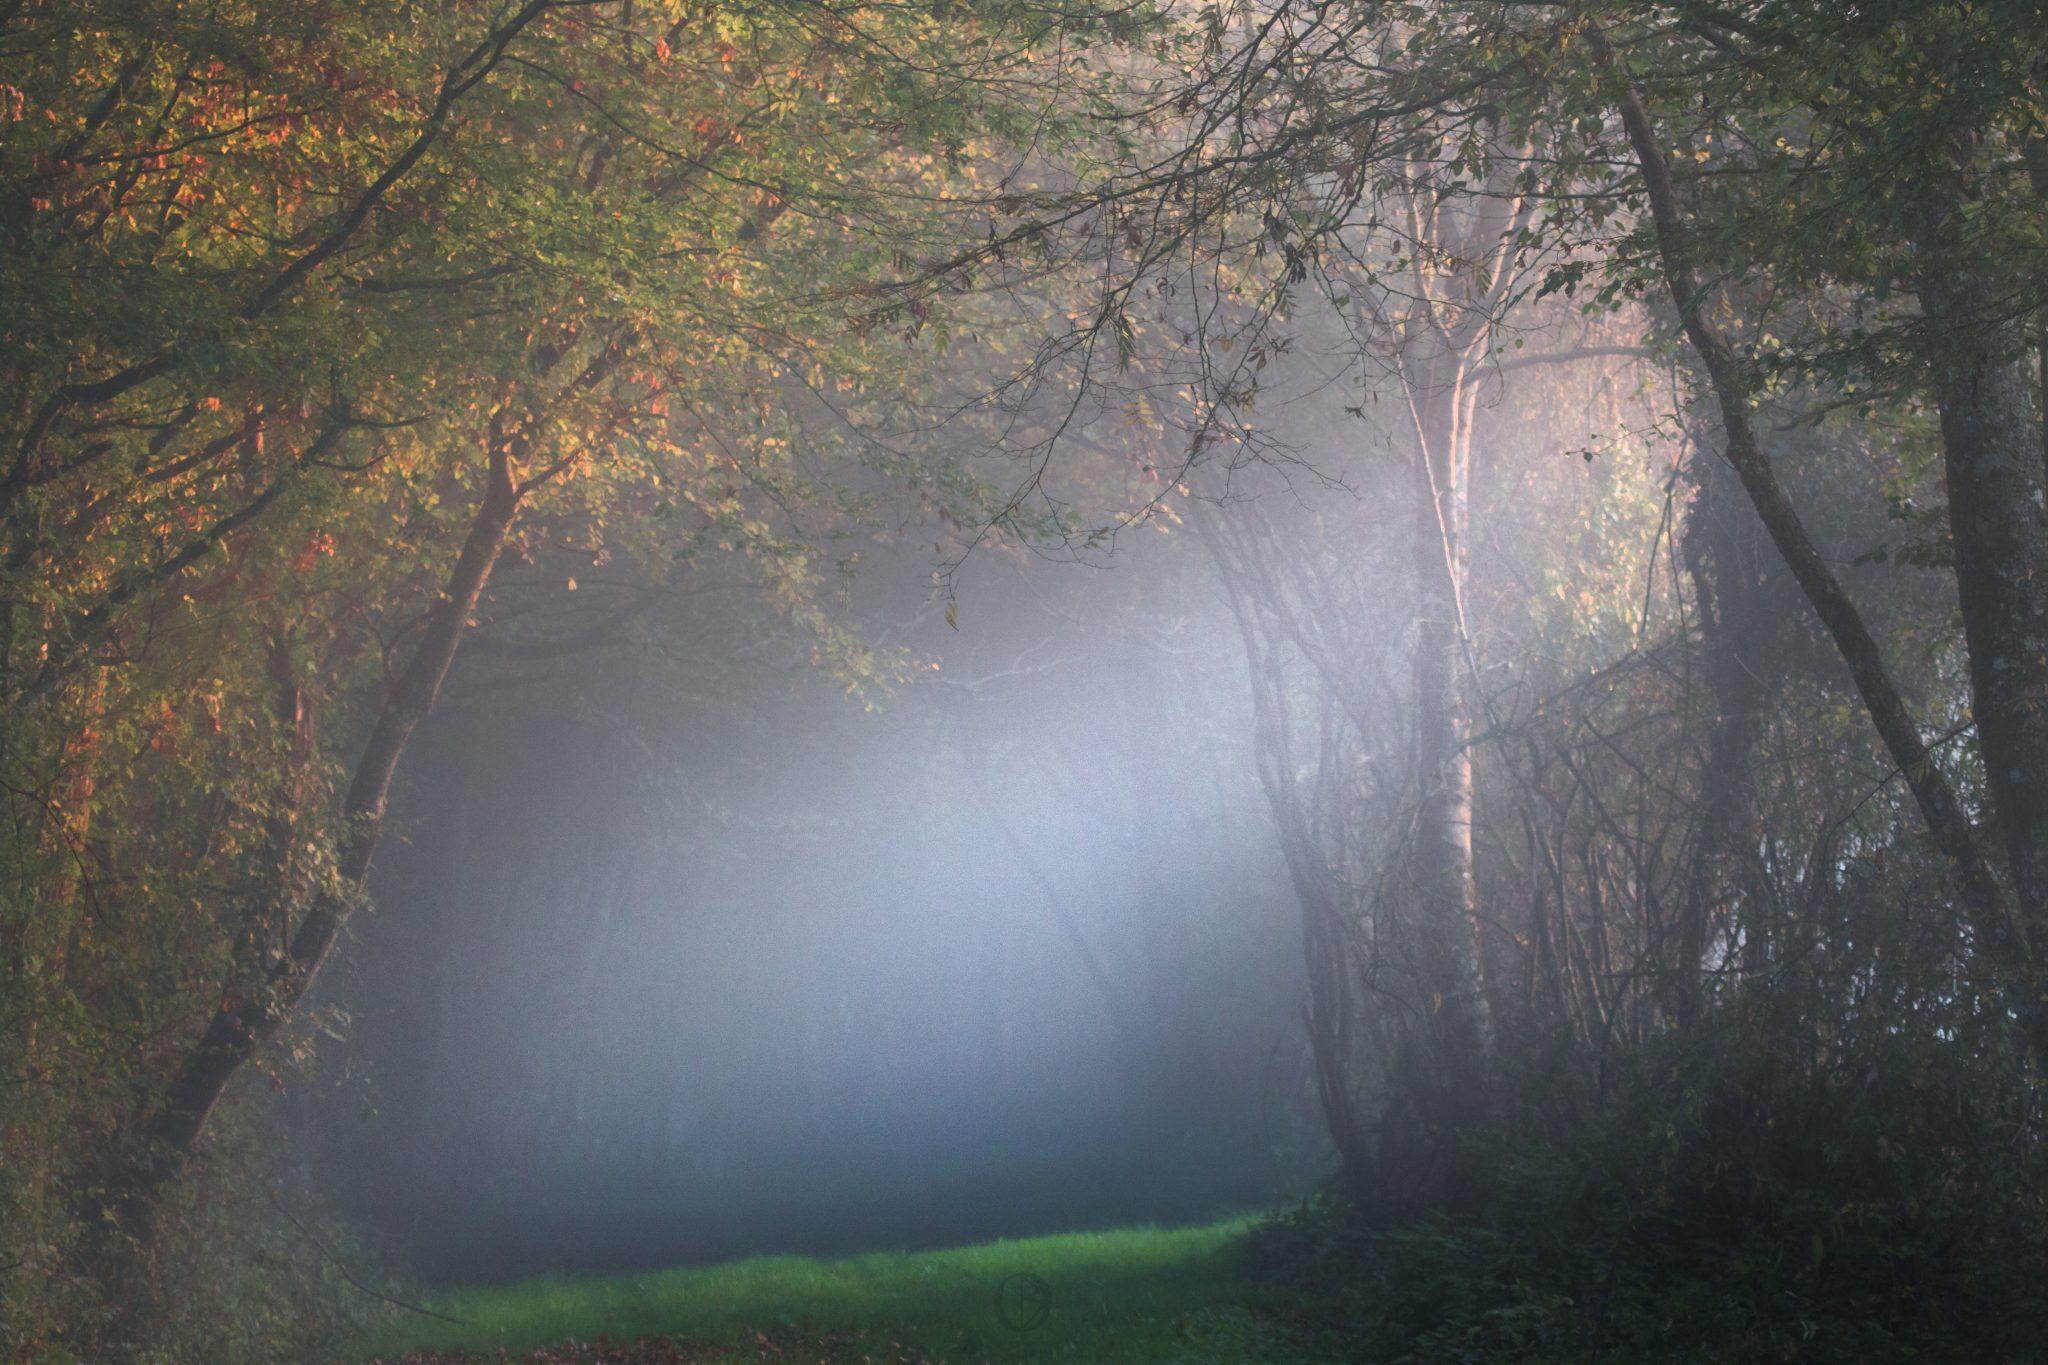 Paysage - Chemin forestier 3 151017 copie